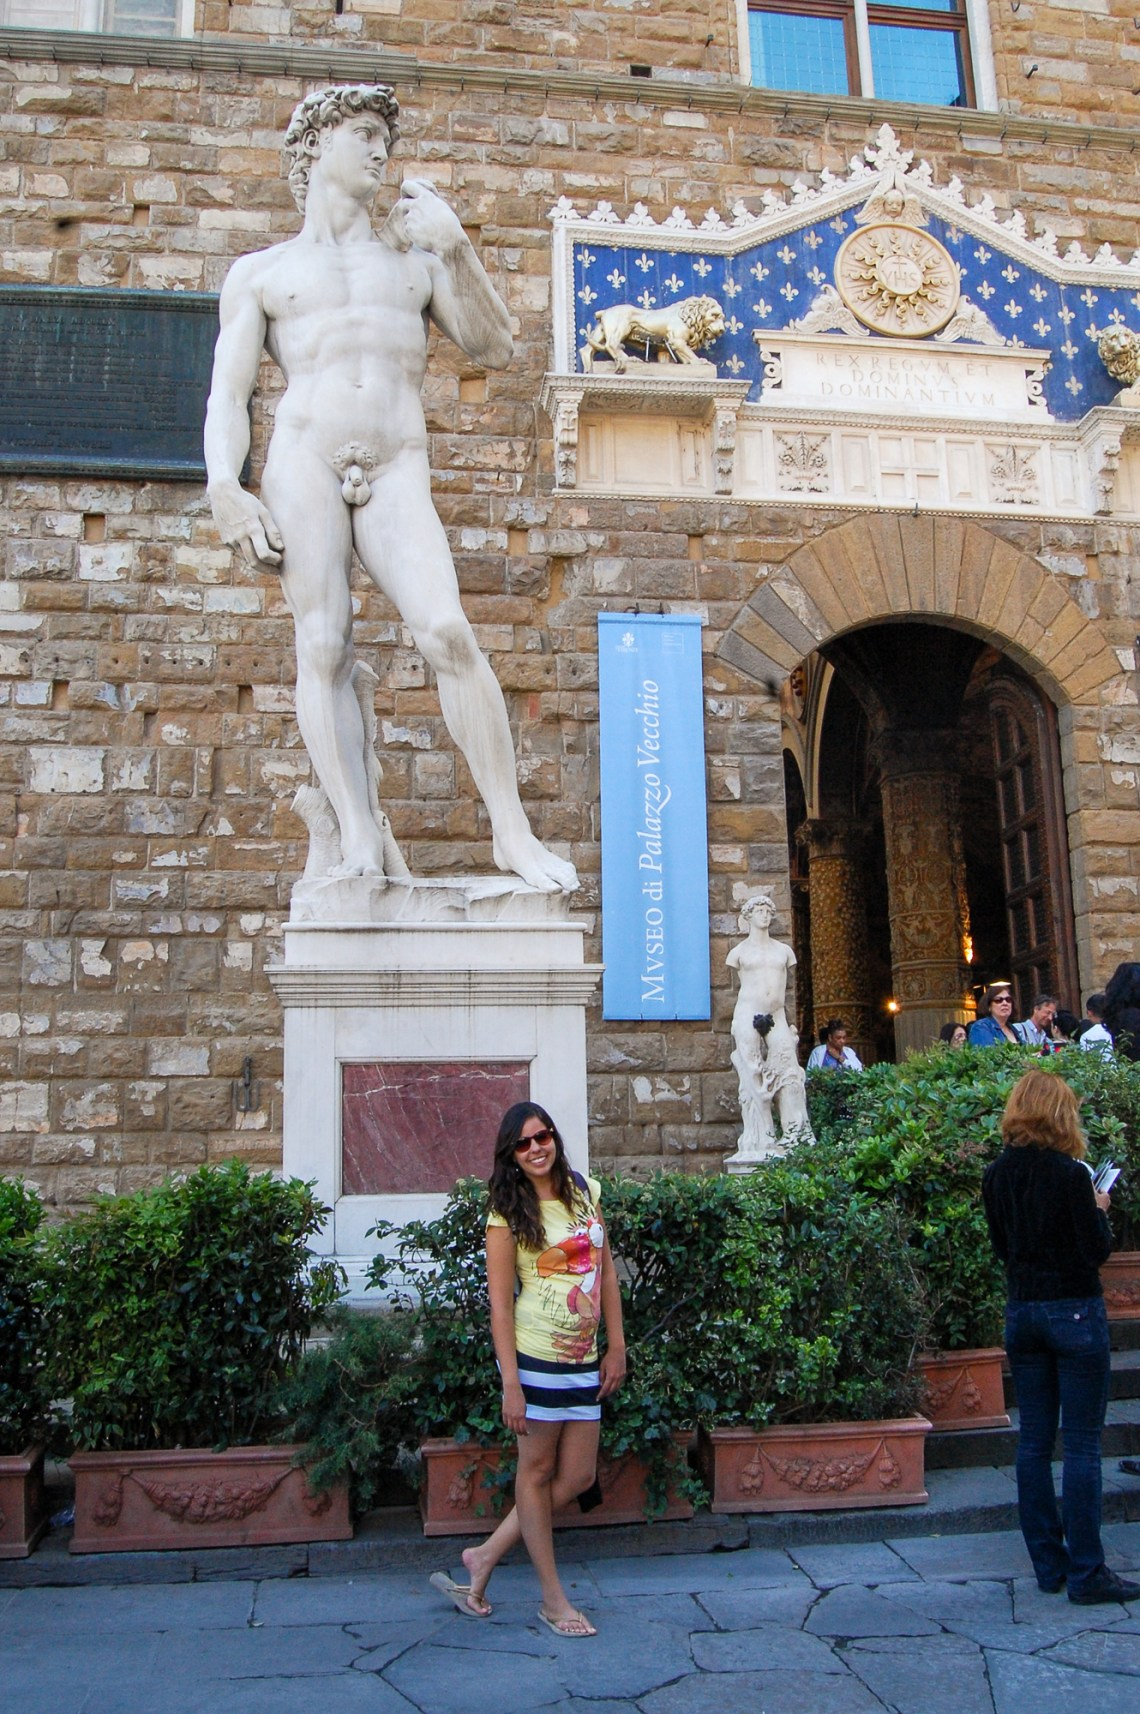 david - michelangelo - florença - toscana - italia - turismo